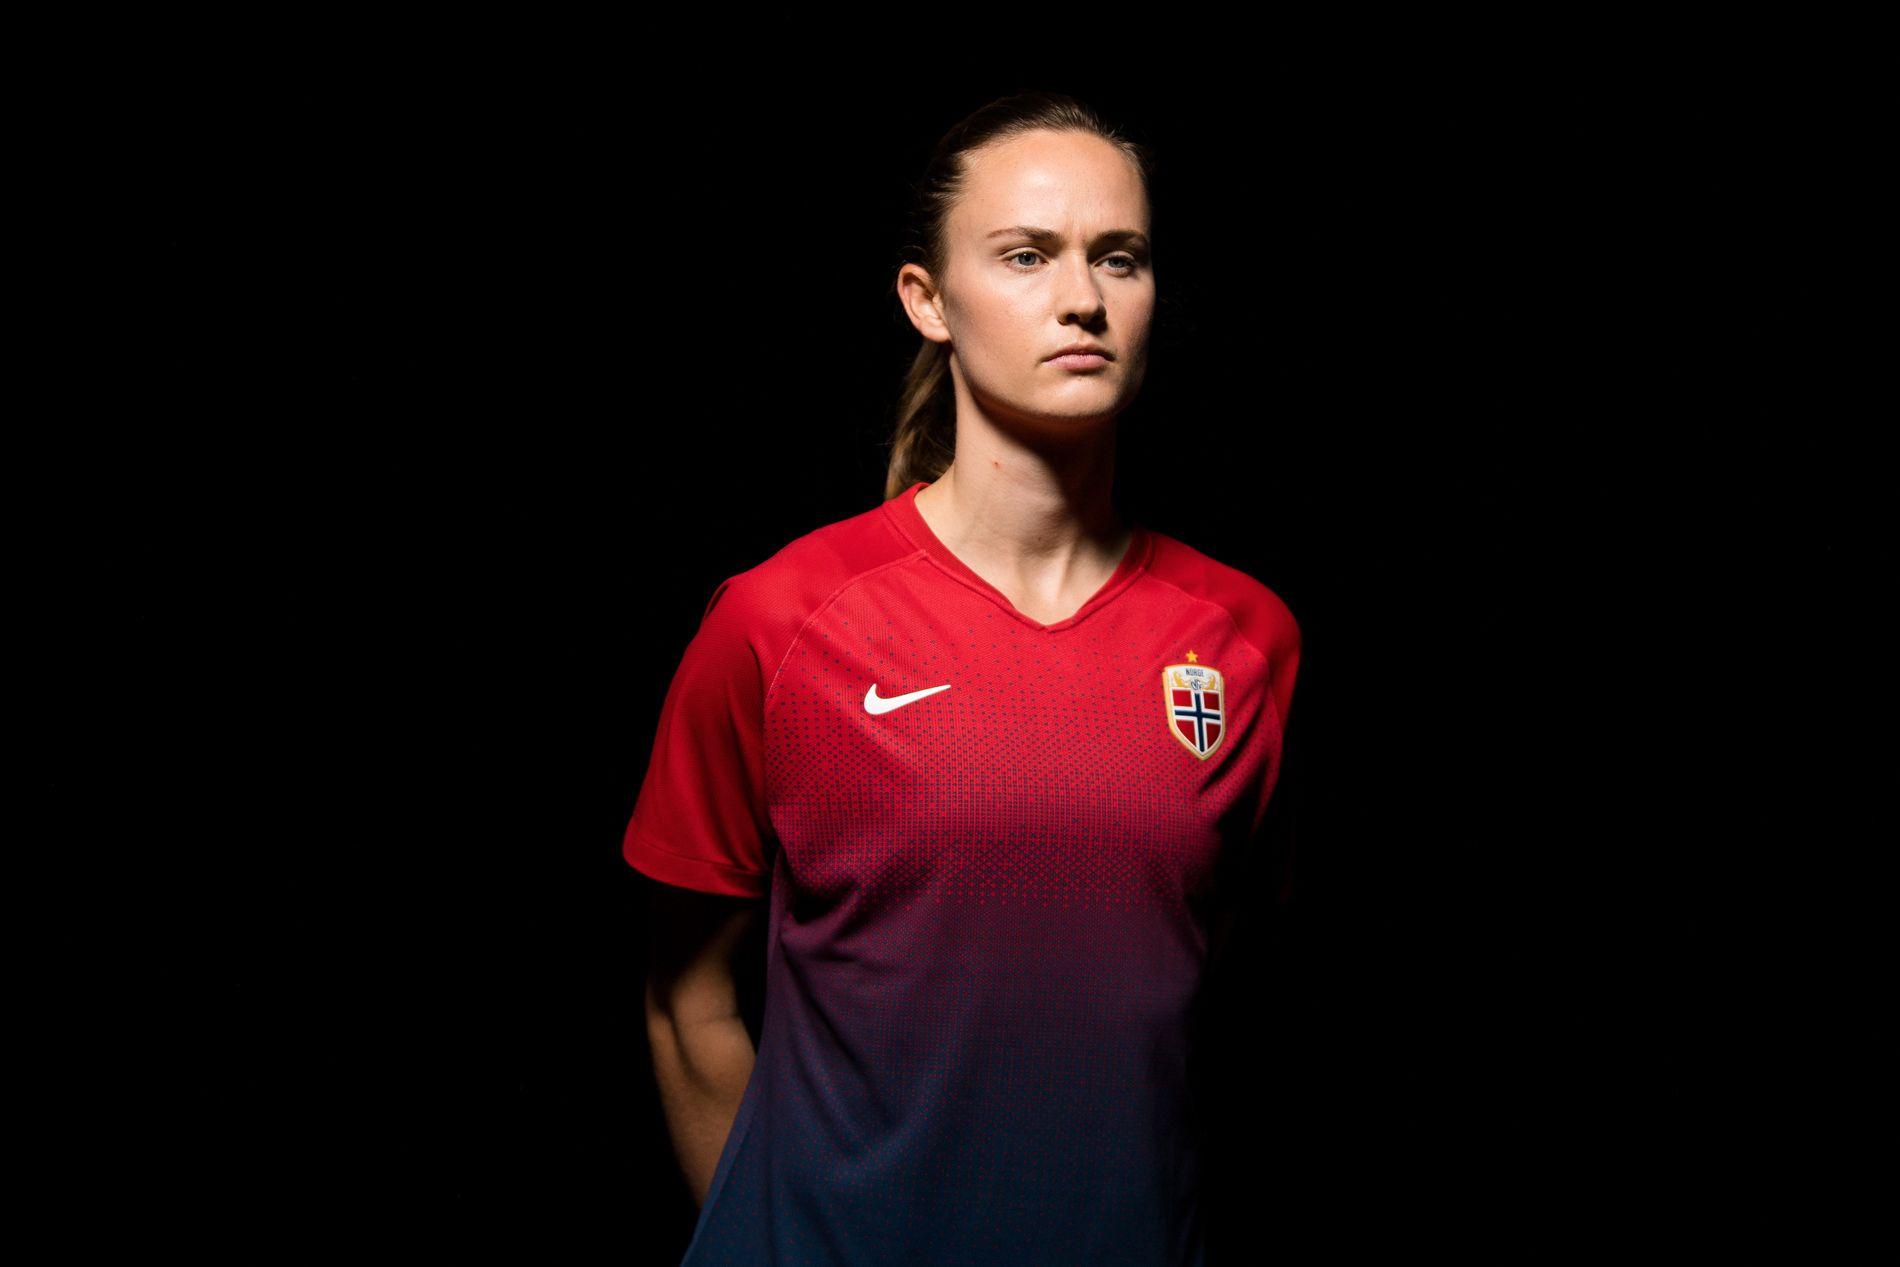 Caroline Graham Hansen spiller kvartfinale i fotball-VM for Norge torsdag.